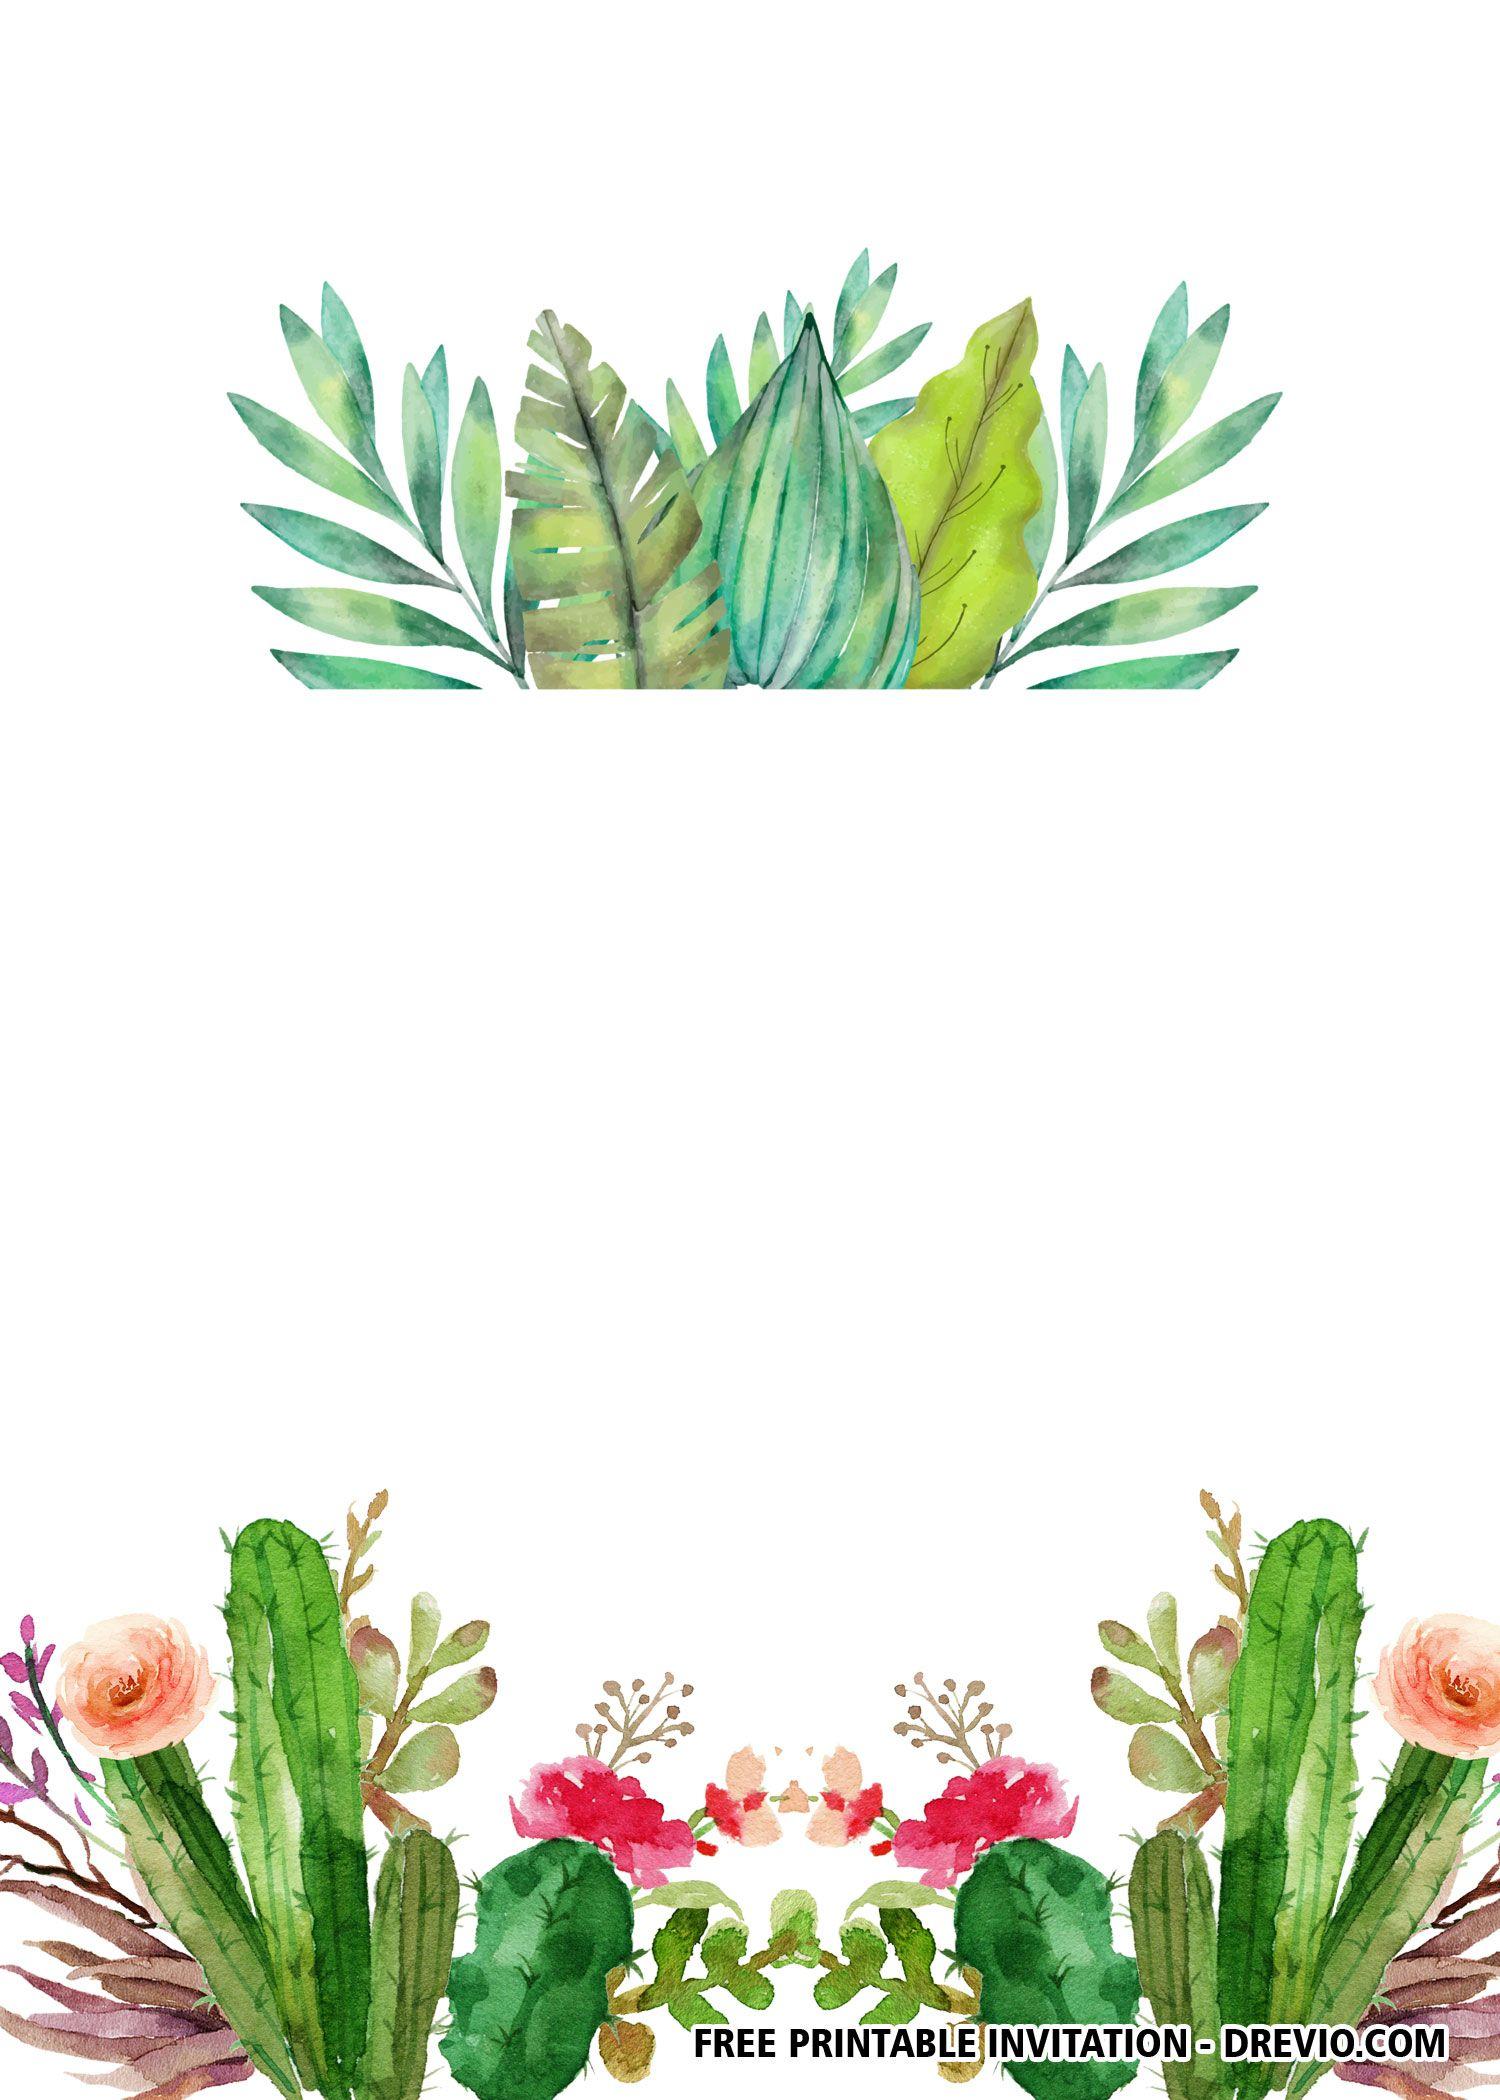 Free Printable Cactus Invitation Templates Cactus Invitation Cactus Printable Cactus Backgrounds